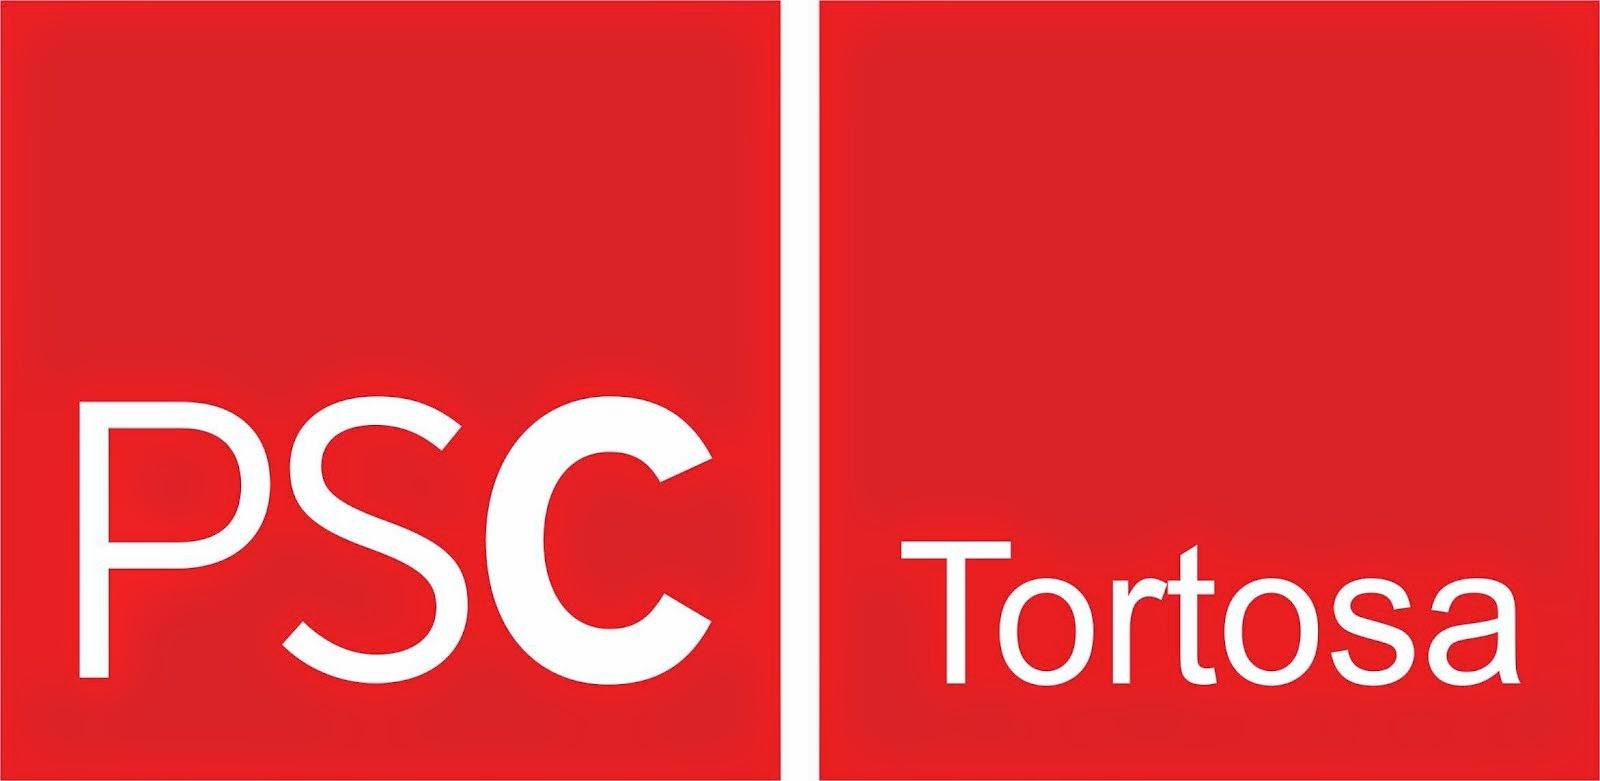 PSC TORTOSA